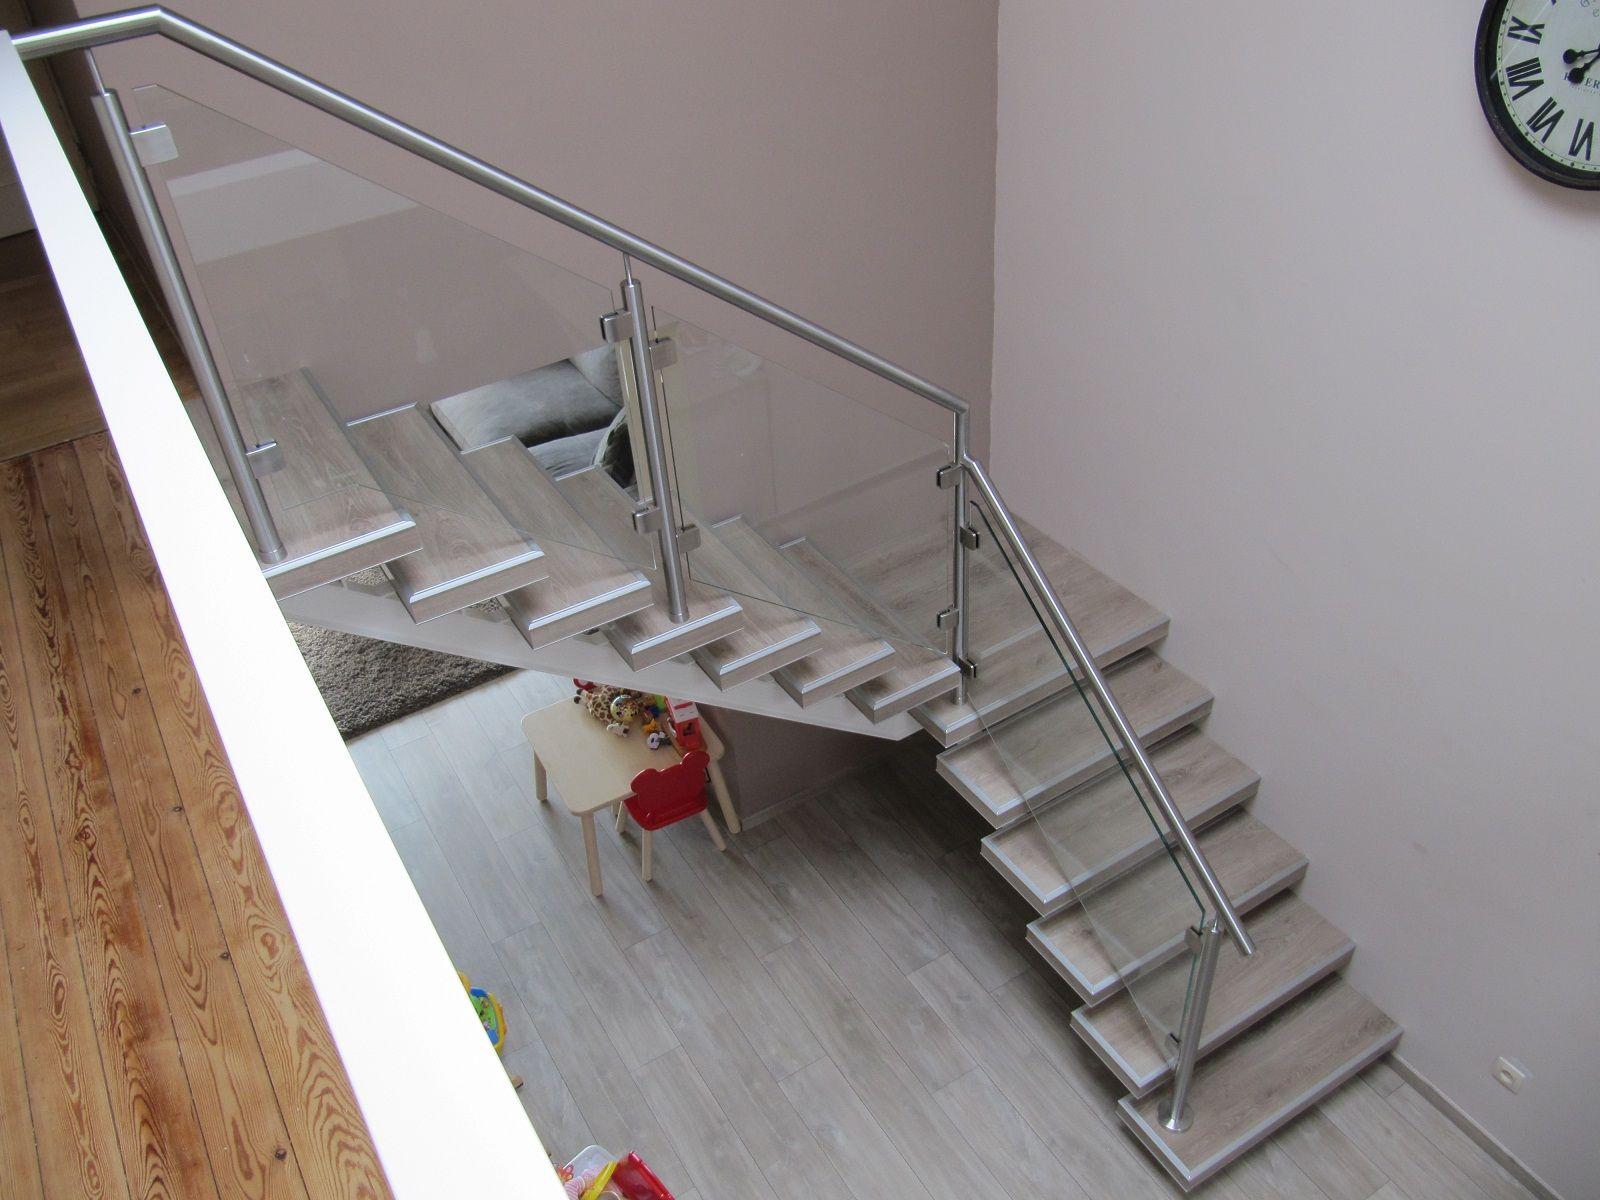 Balustrade glazen hekje schuin langs trap lumigrip rvs glazen balustrades pinterest - Balustrade trap ...